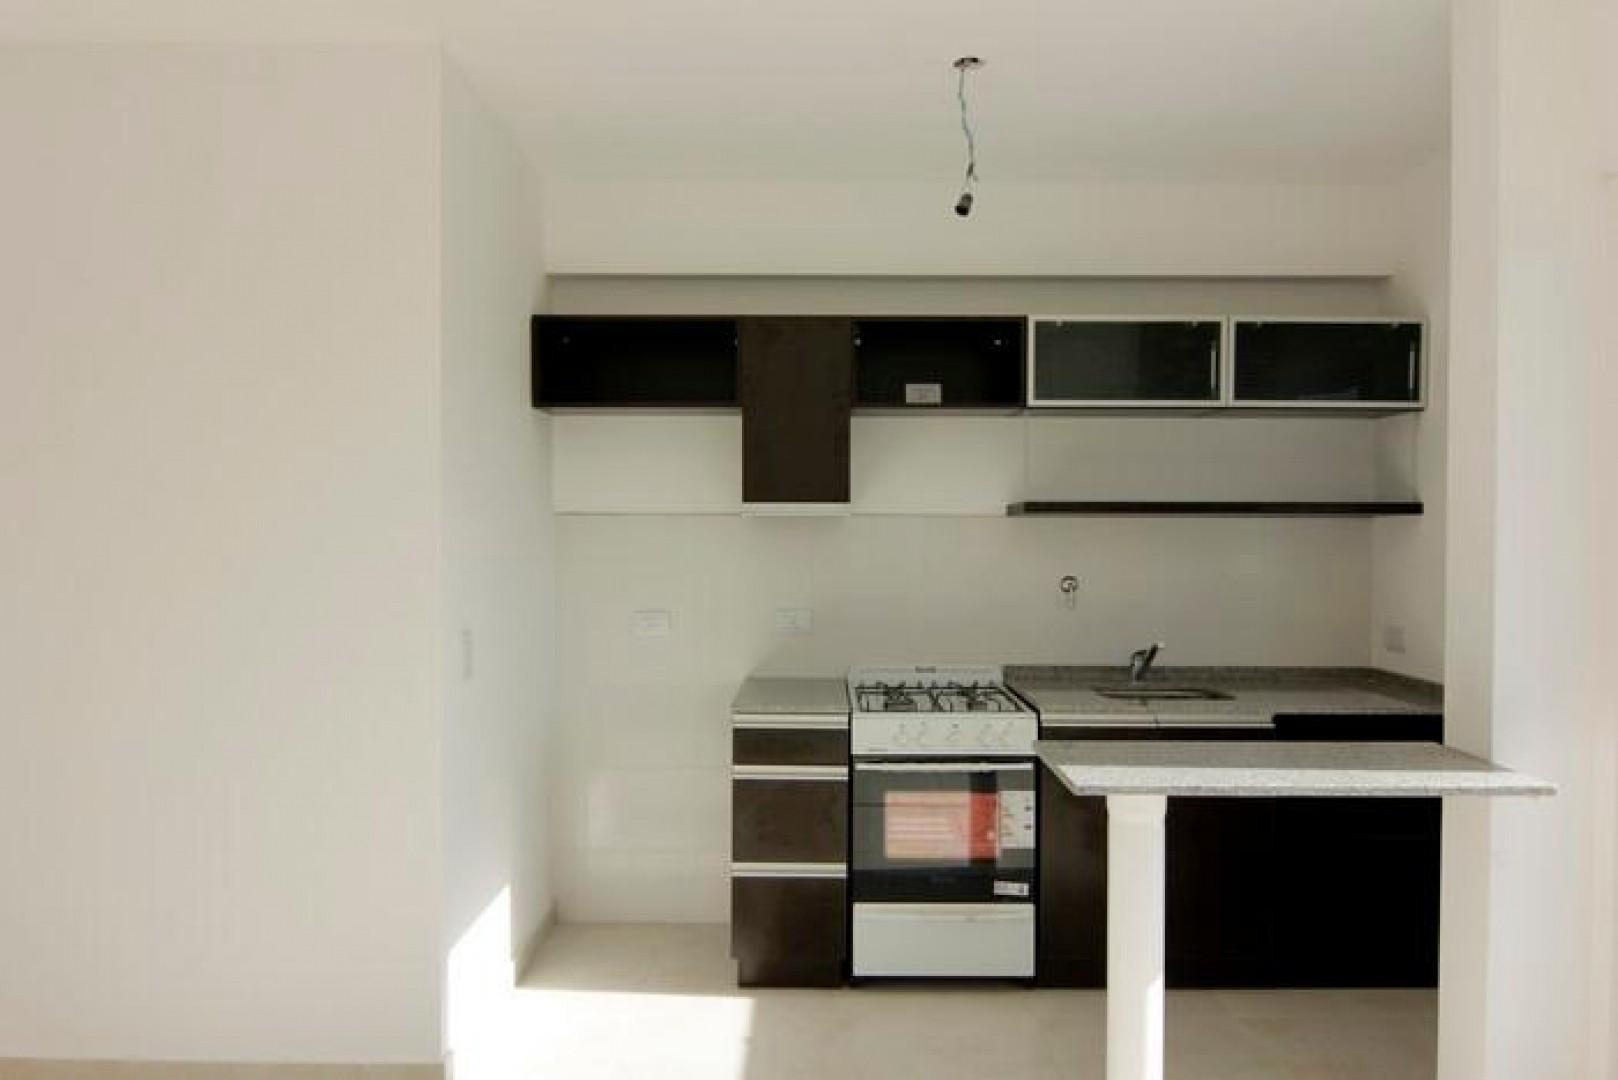 MOSCONI 3400 - VILLA PUEYRREDON